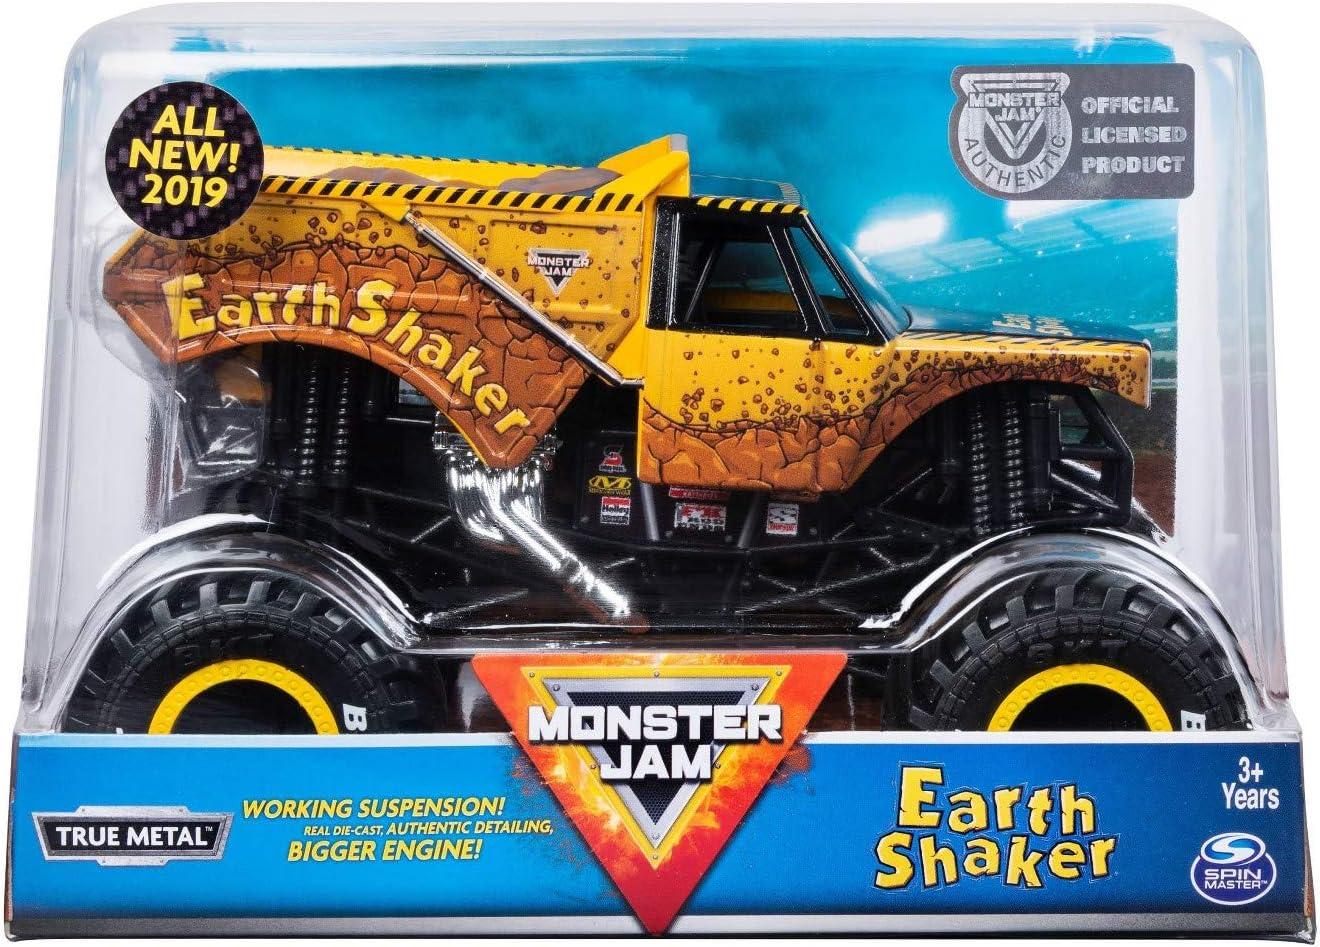 Amazon Com Mj Monster Jam Official Earth Shaker Monster Truck Die Cast Vehicle 1 24 Scale Toys Games